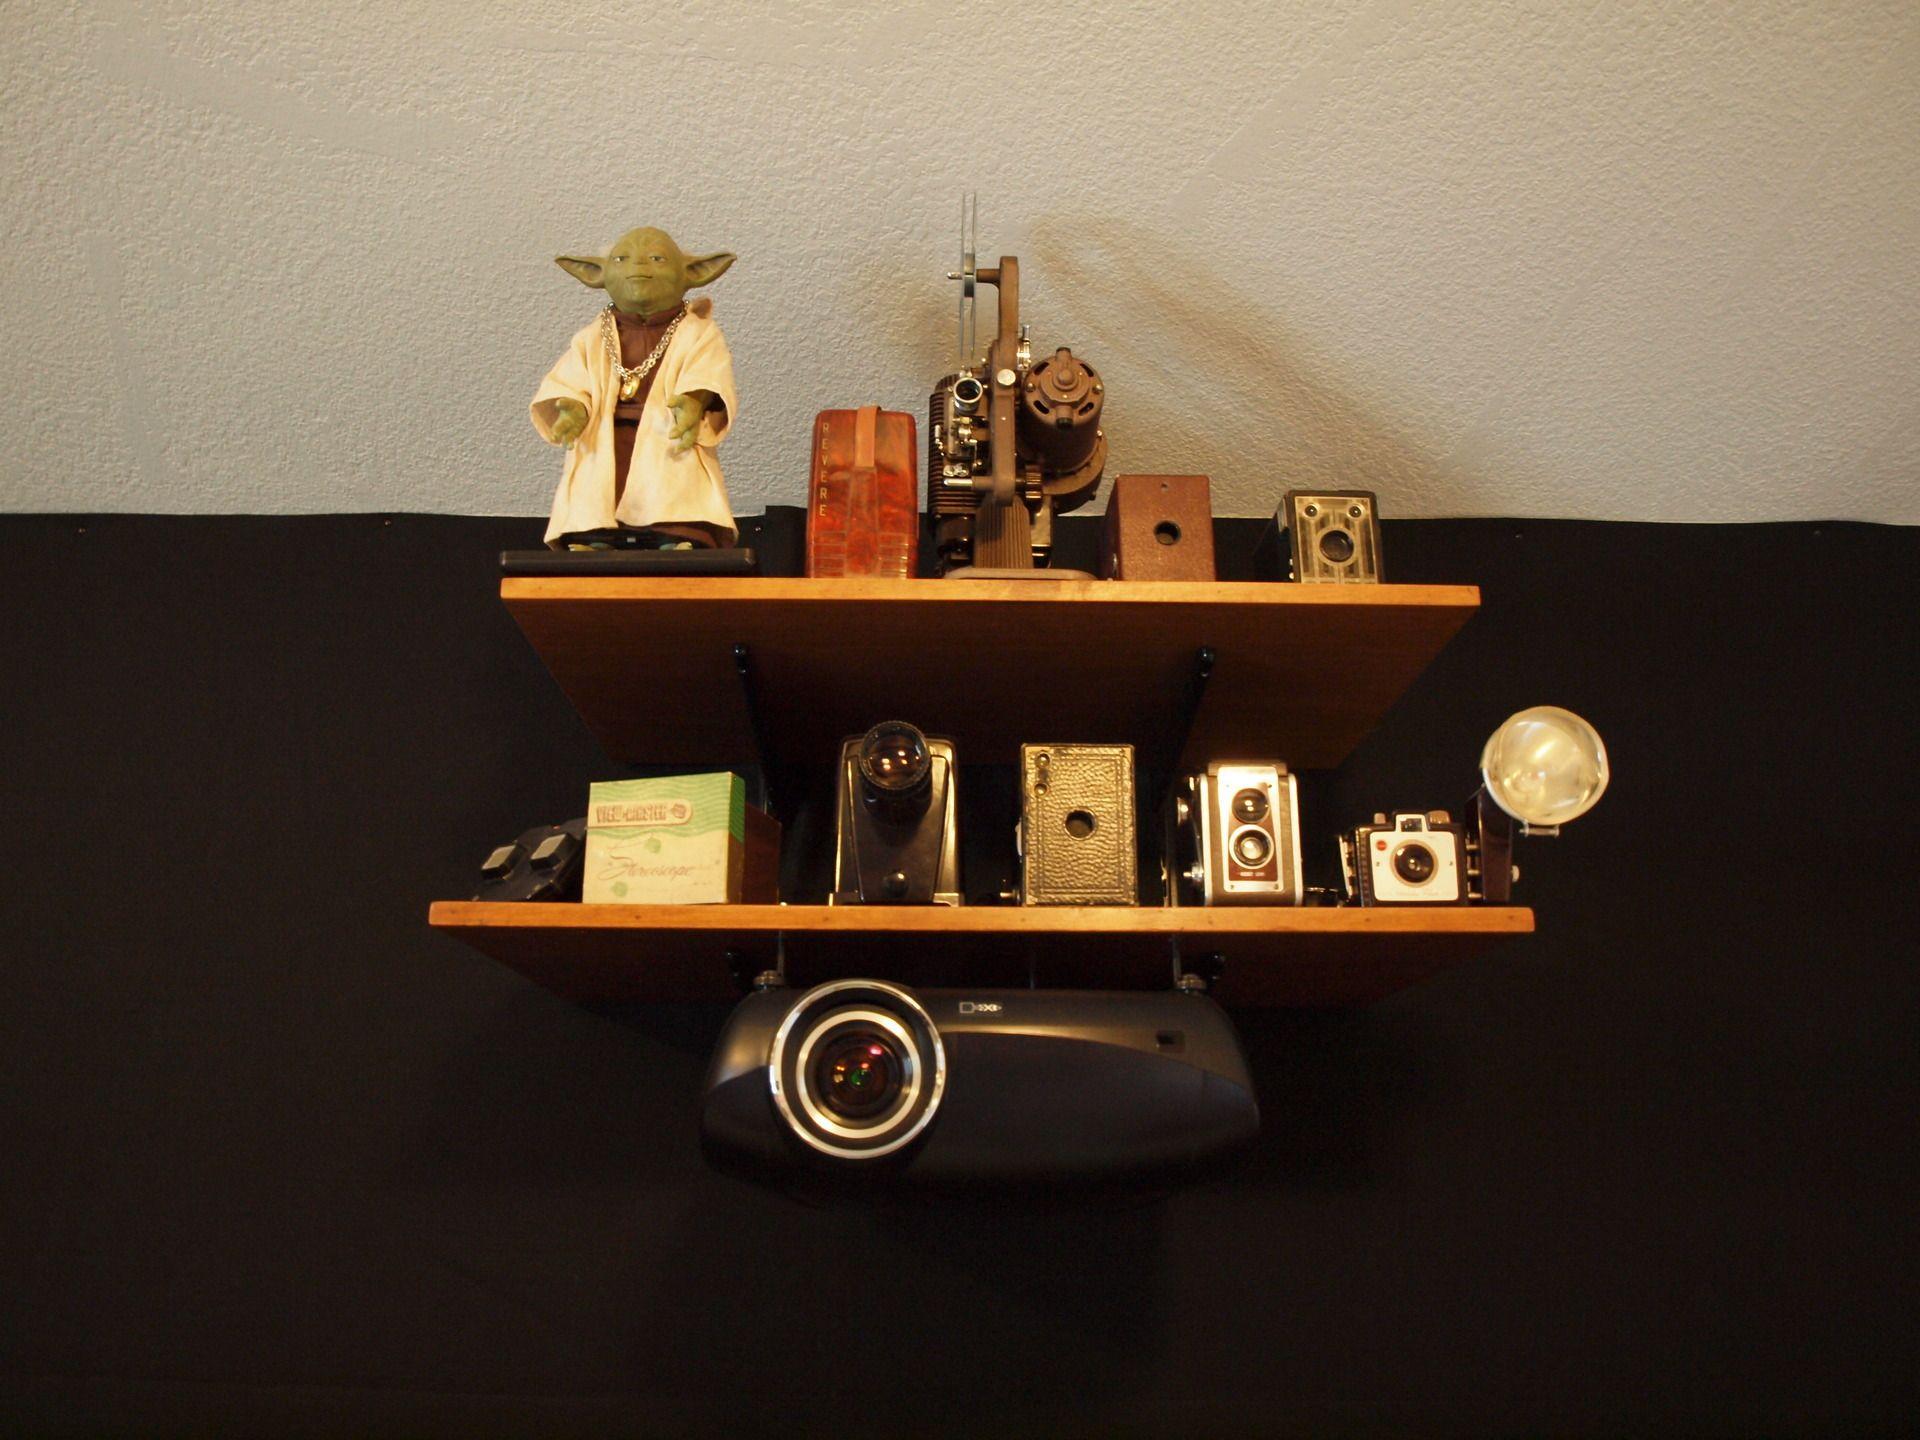 mounting projector underneath shelf on back wall avs forum